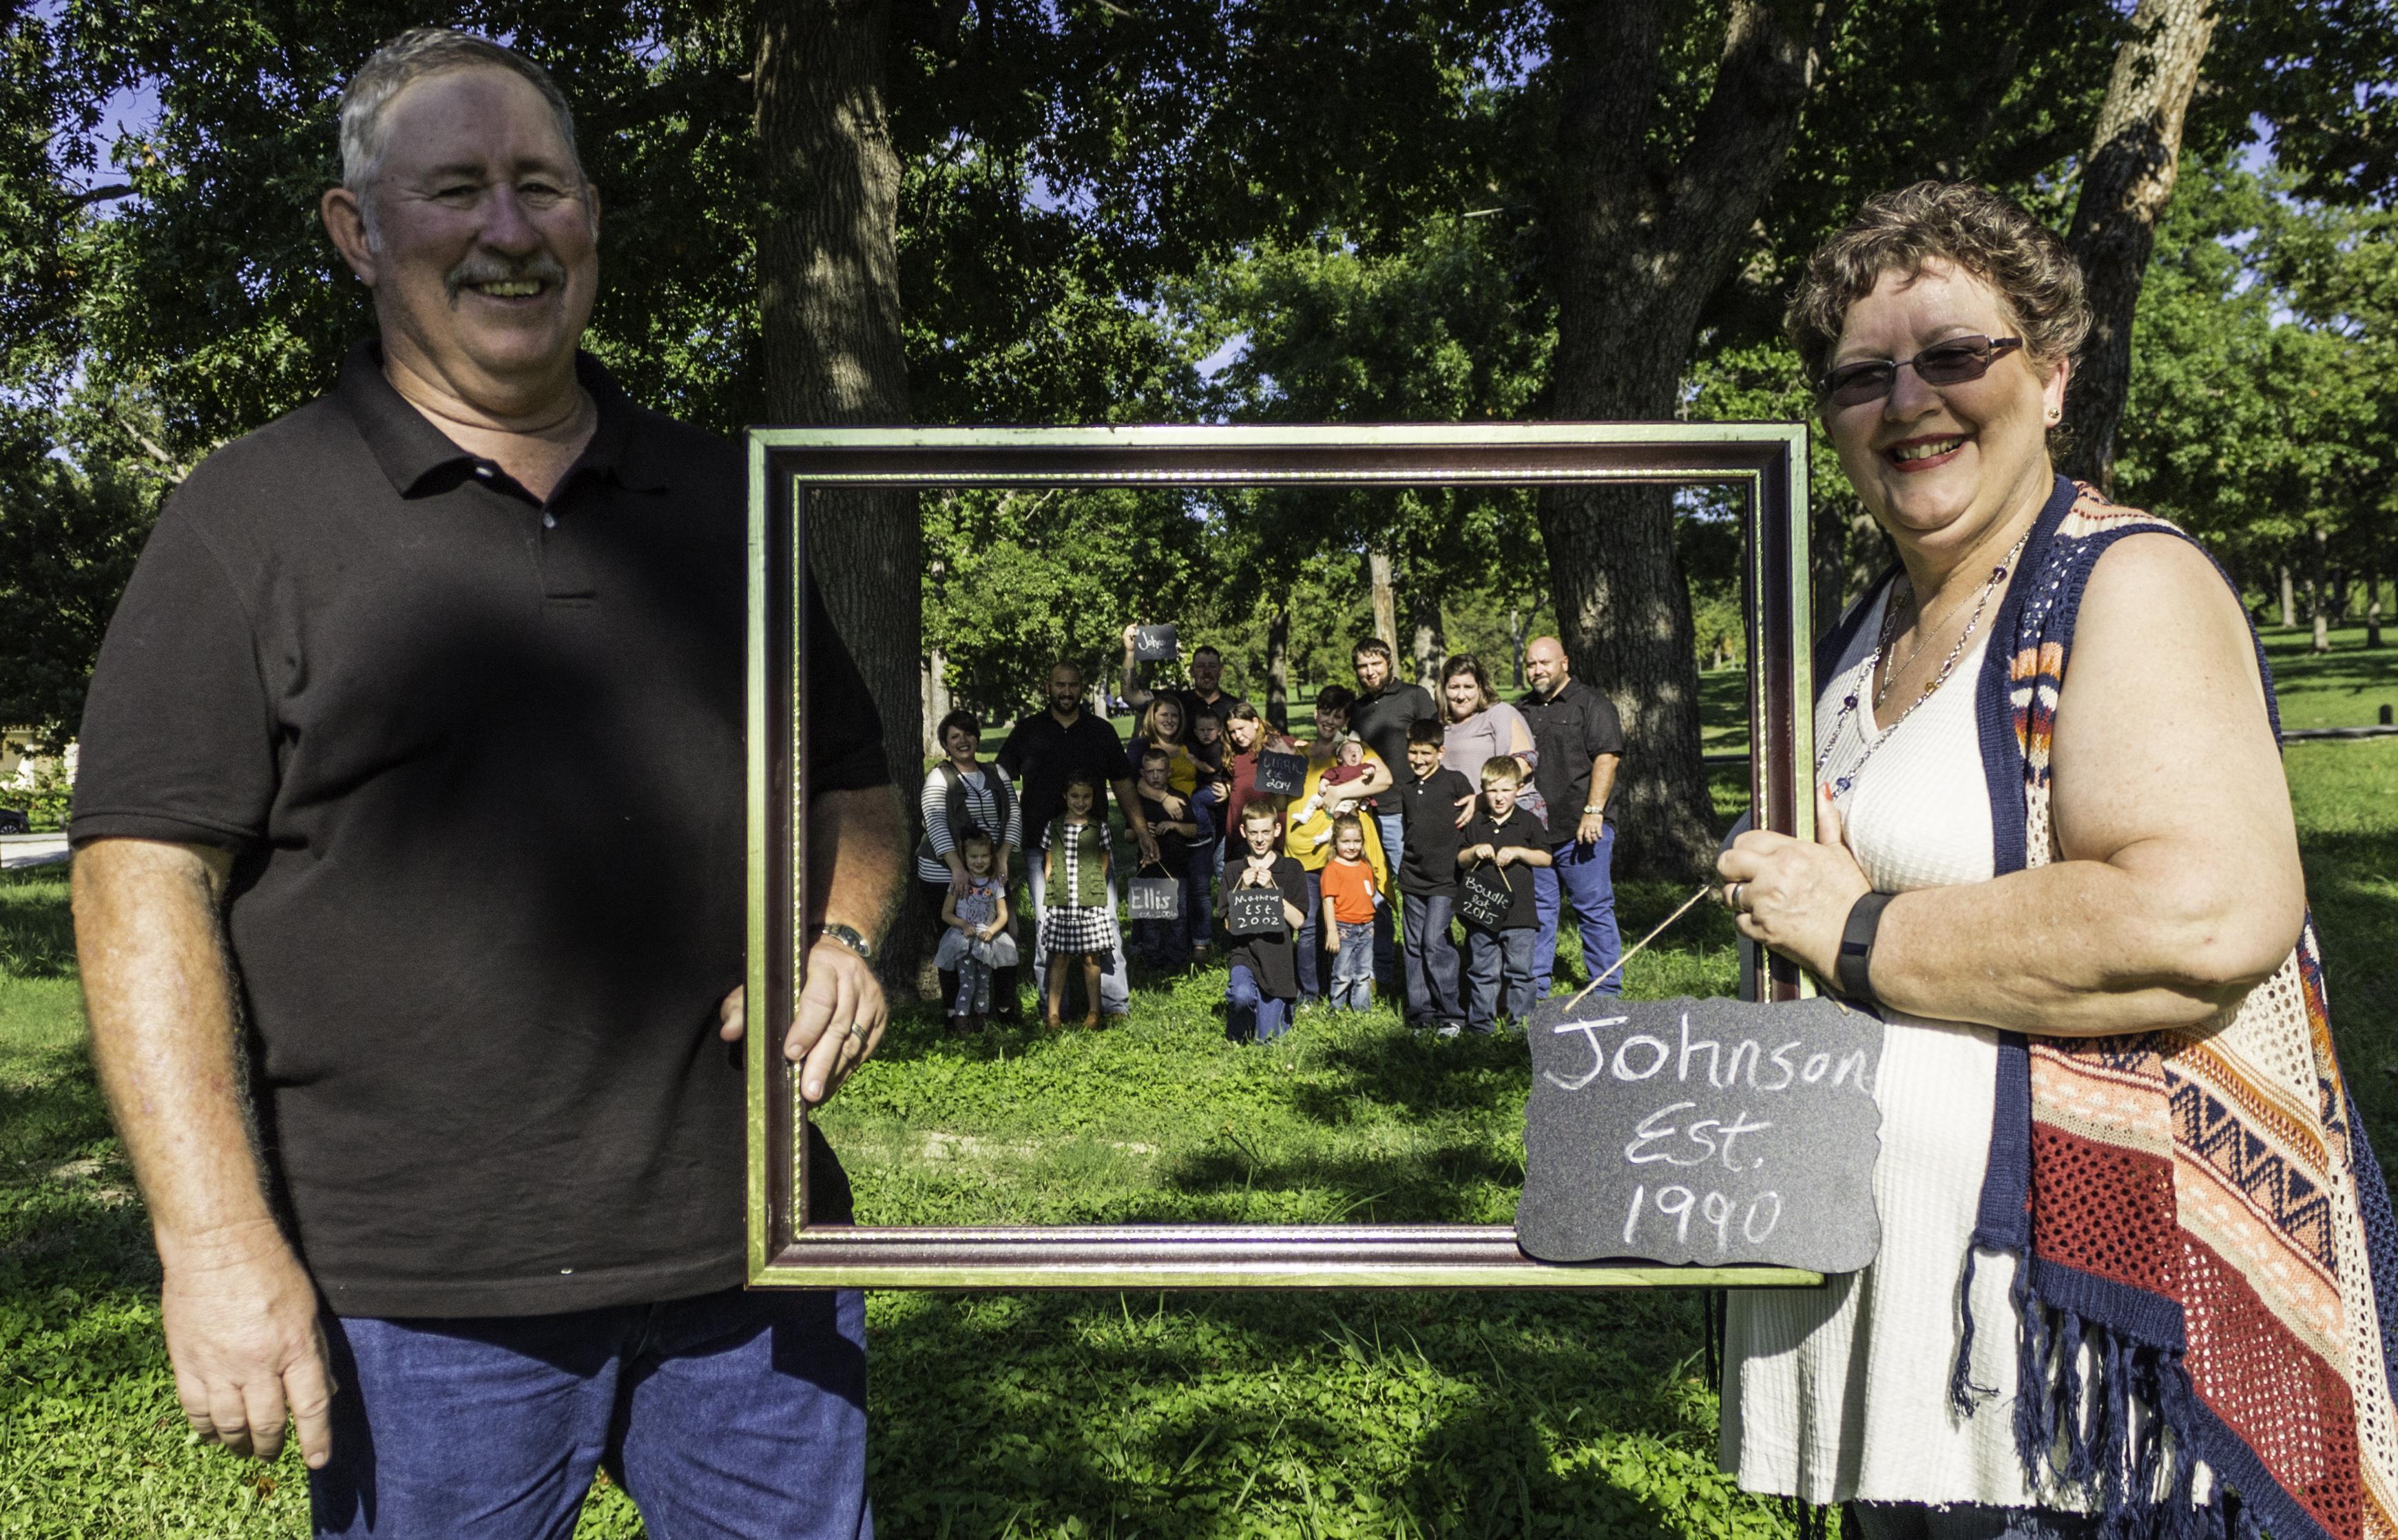 Johnson Family Photoshoot-8